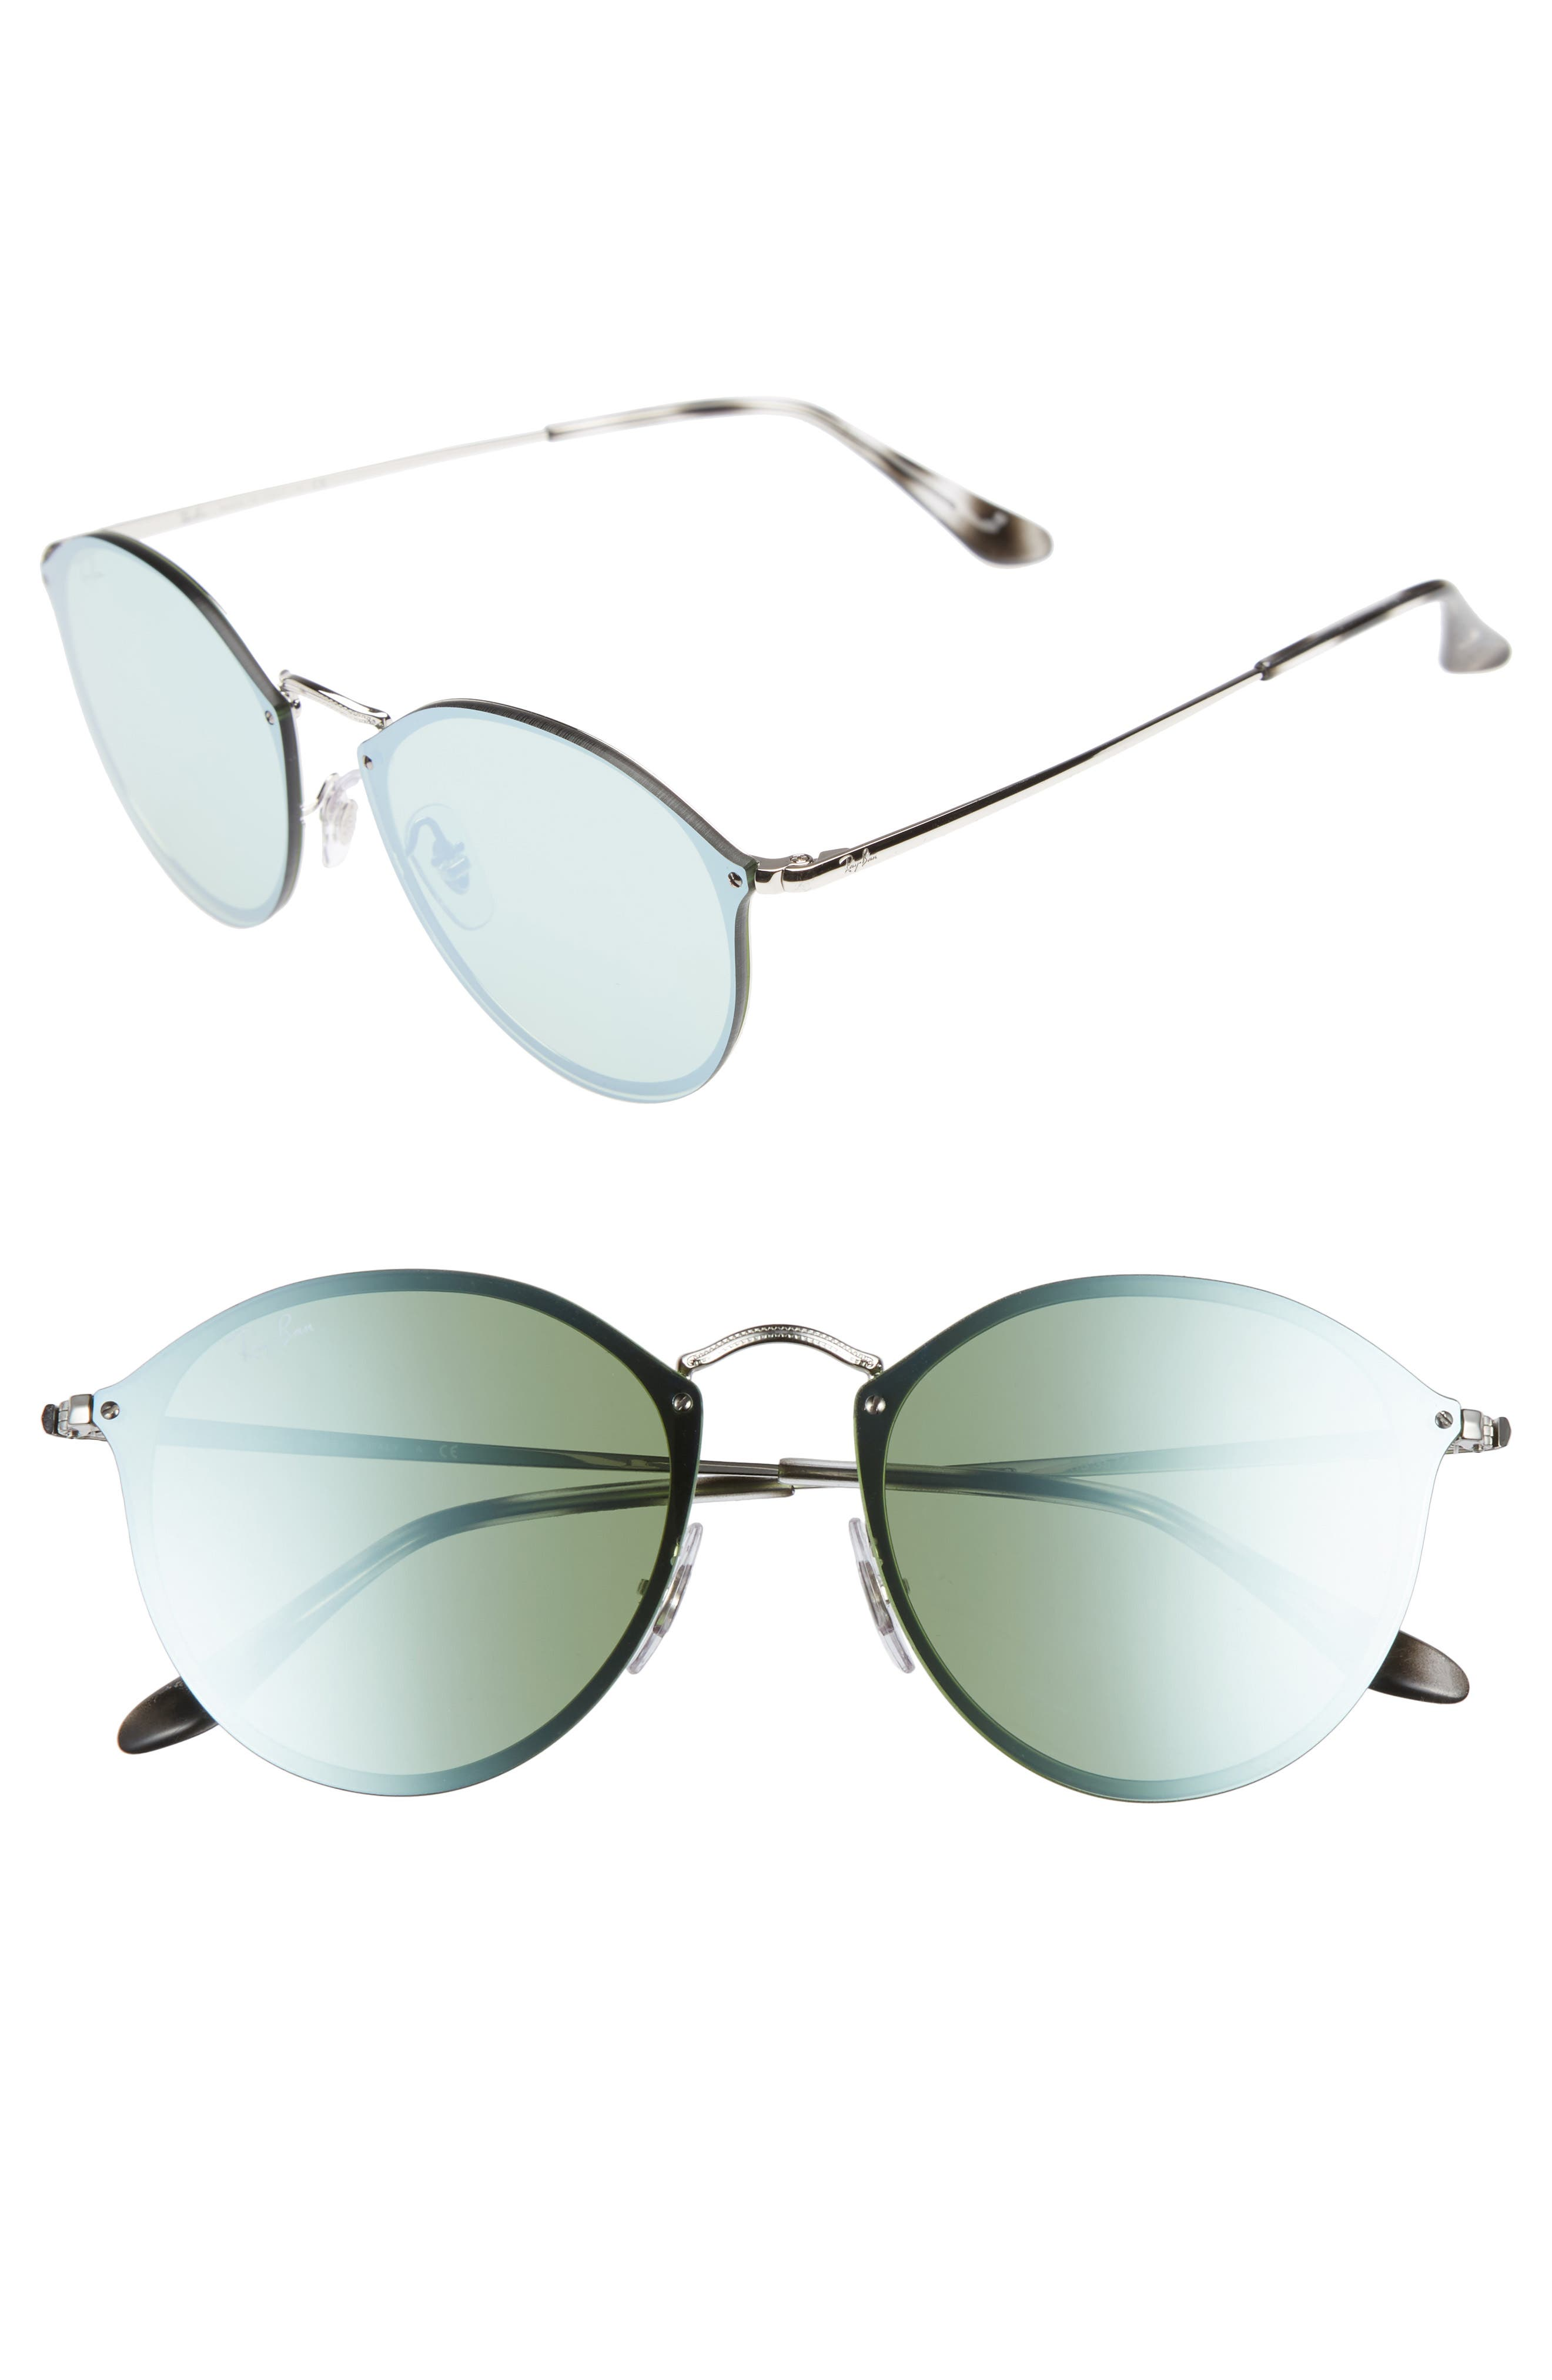 59mm Round Sunglasses,                         Main,                         color, 041